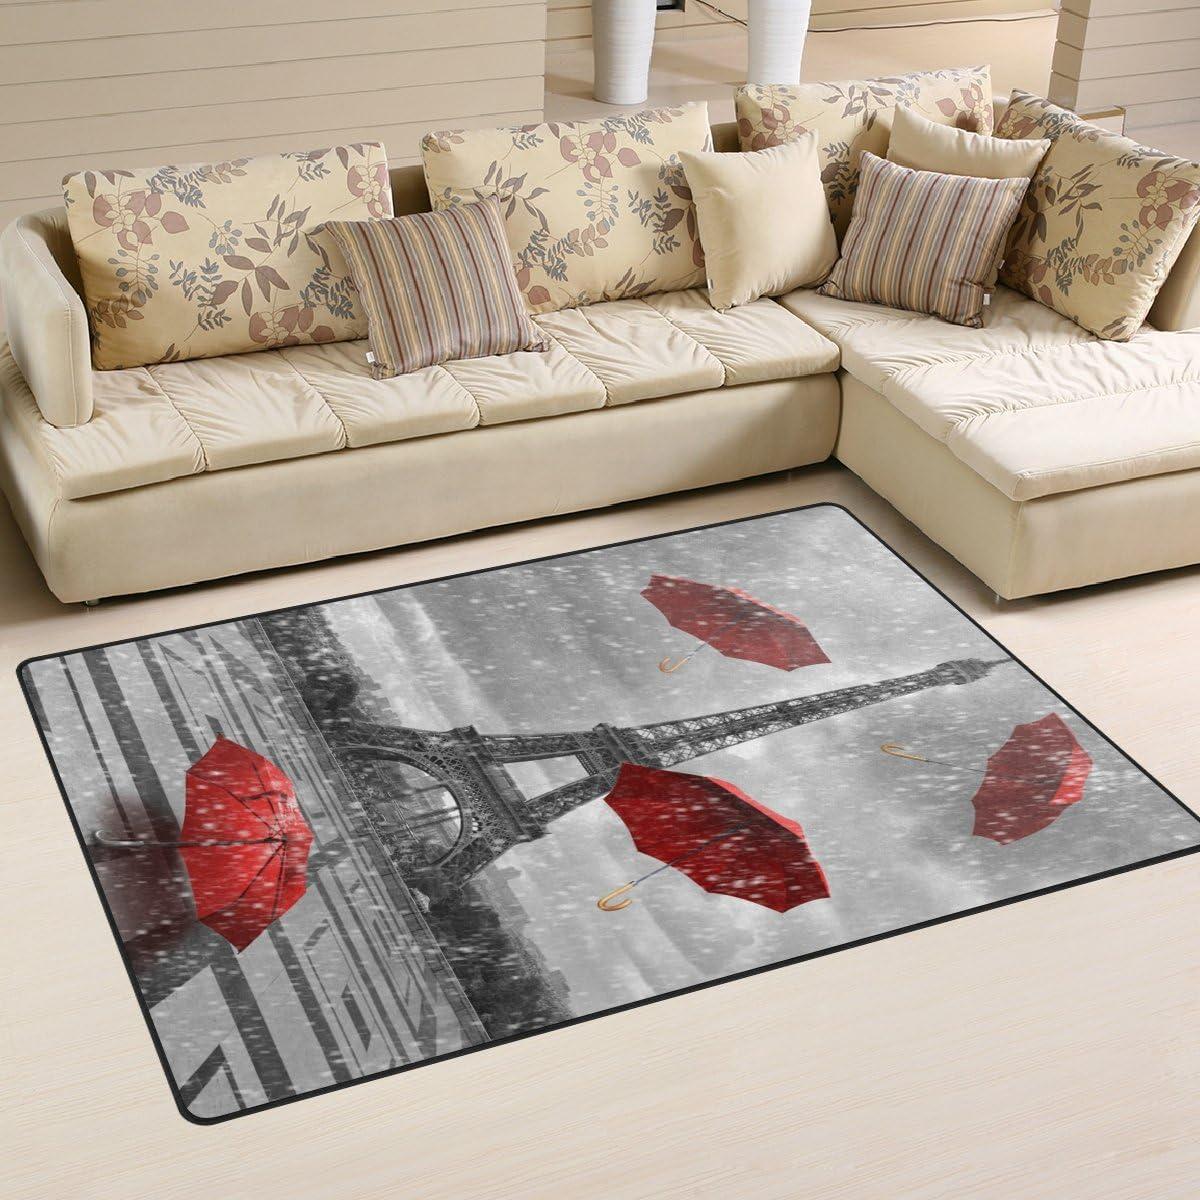 WellLee Area Rug,Fantasy Eiffel Tower Rainy Windy Flying Umbrella Floor Rug Non-Slip Doormat for Living Dining Dorm Room Bedroom Decor 31x20 Inch